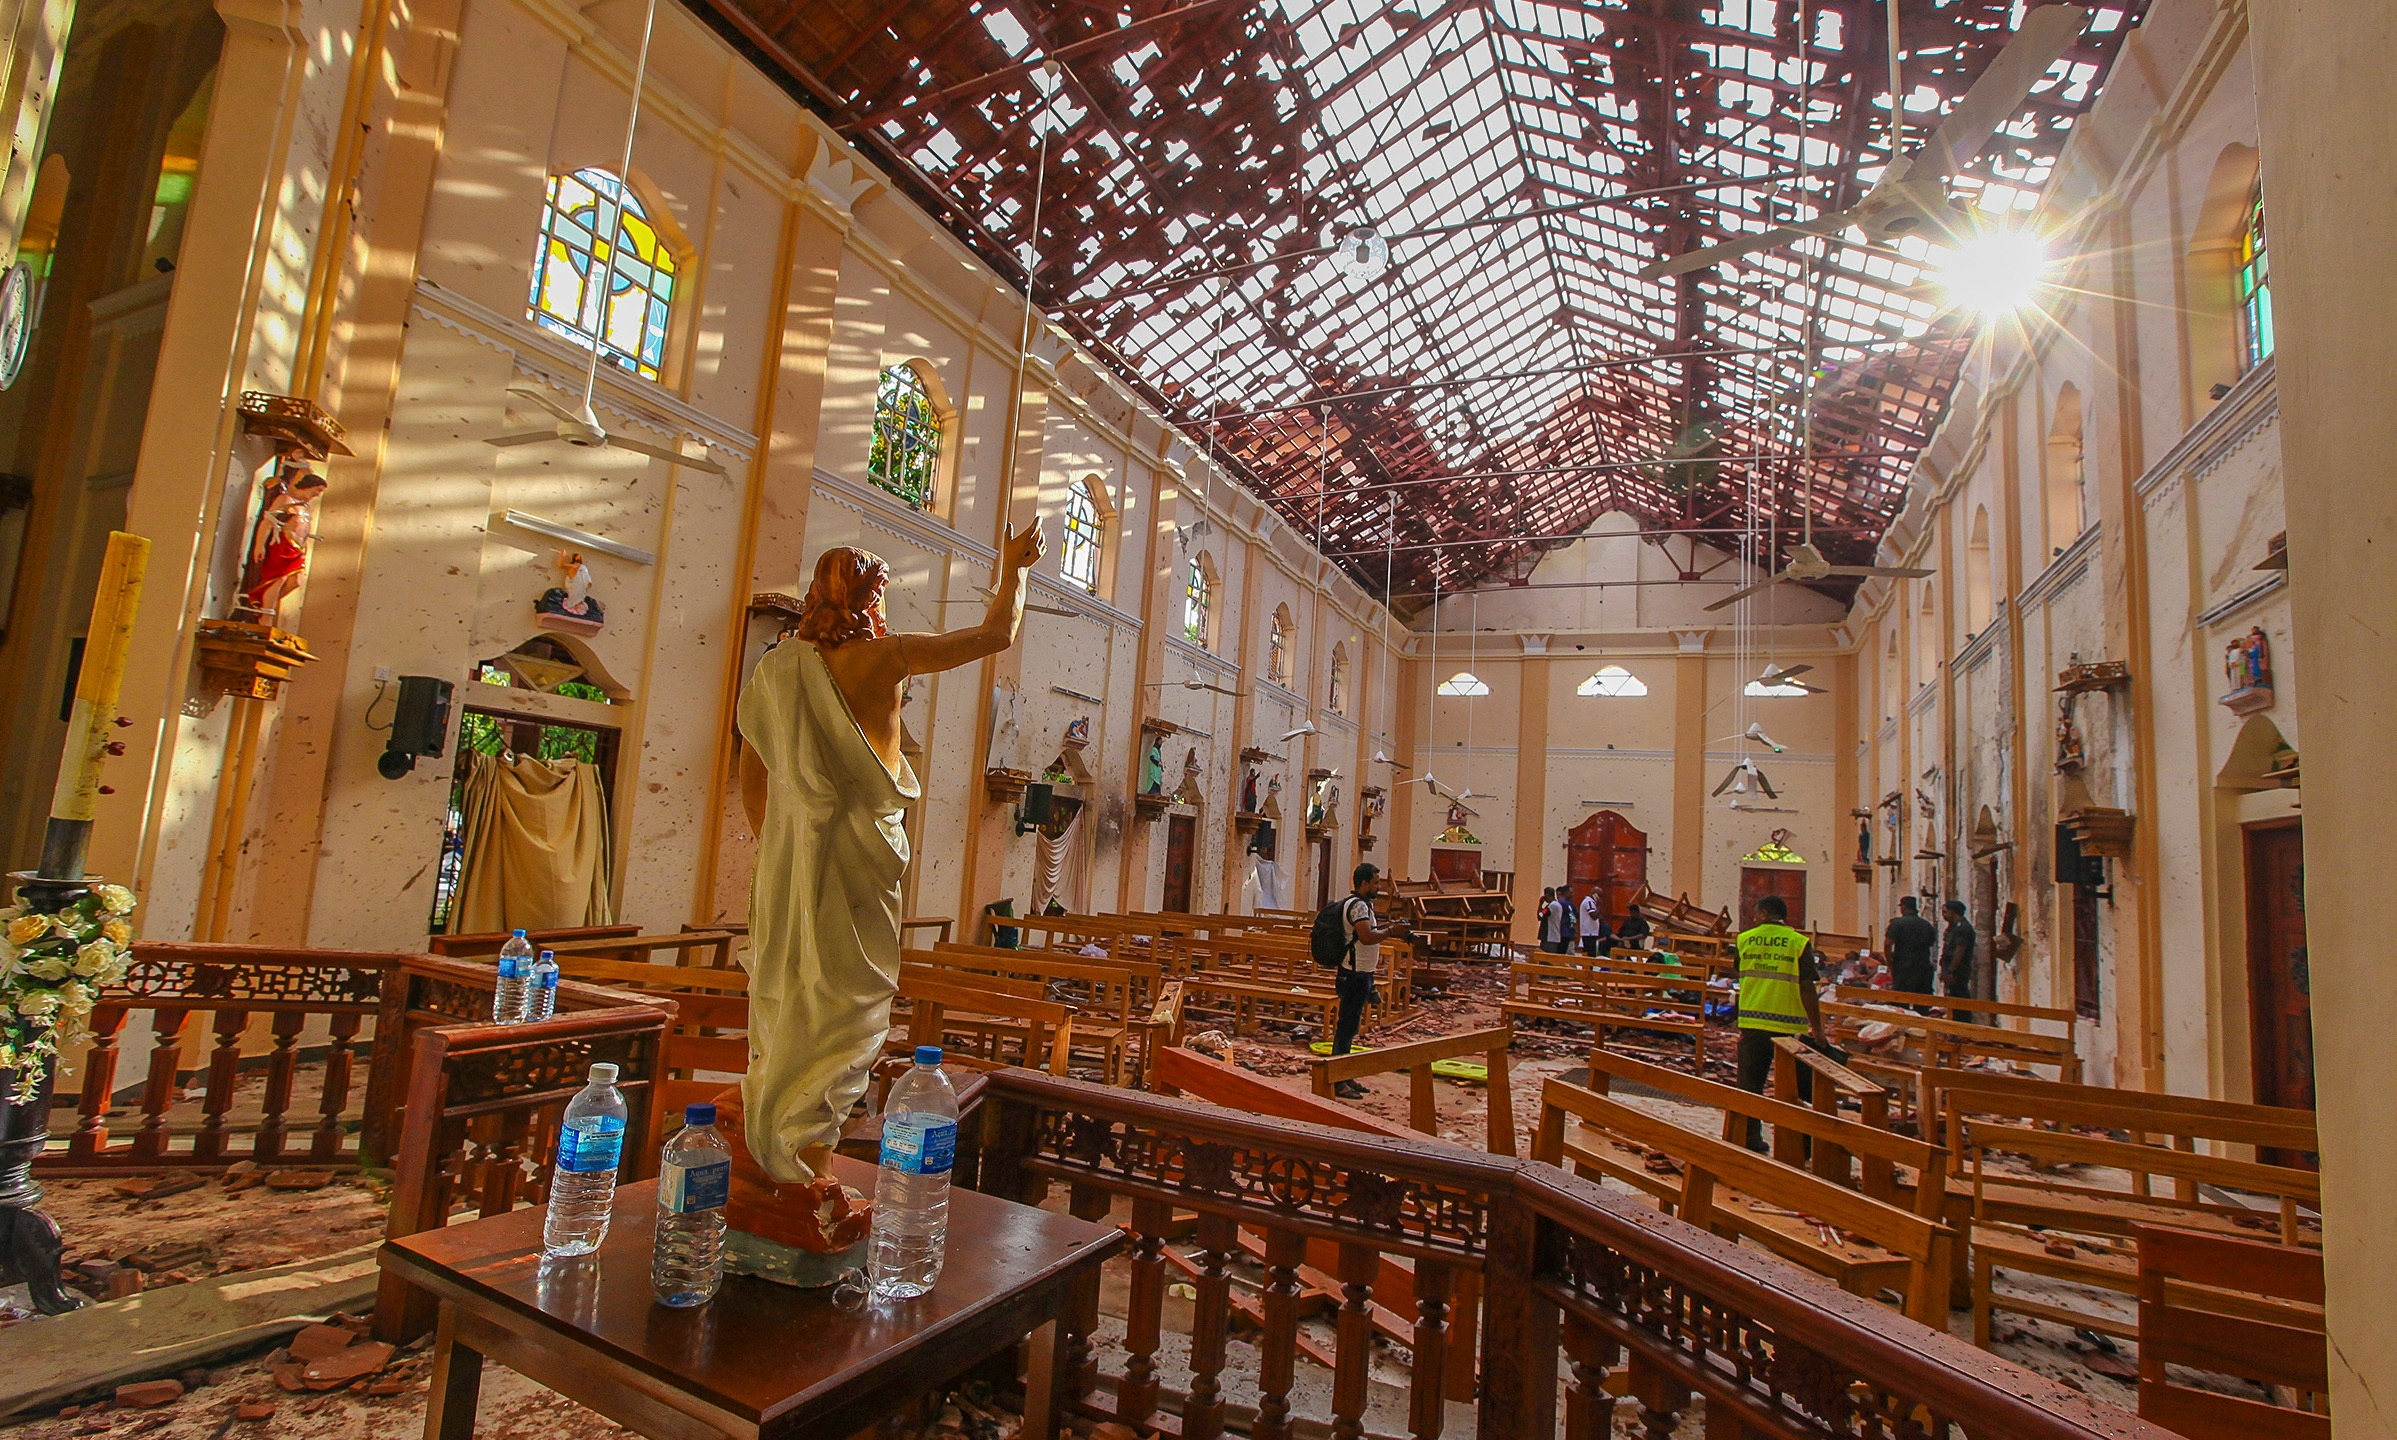 Sri_Lanka_Suicide_Bombings_88020-159532.jpg22449853